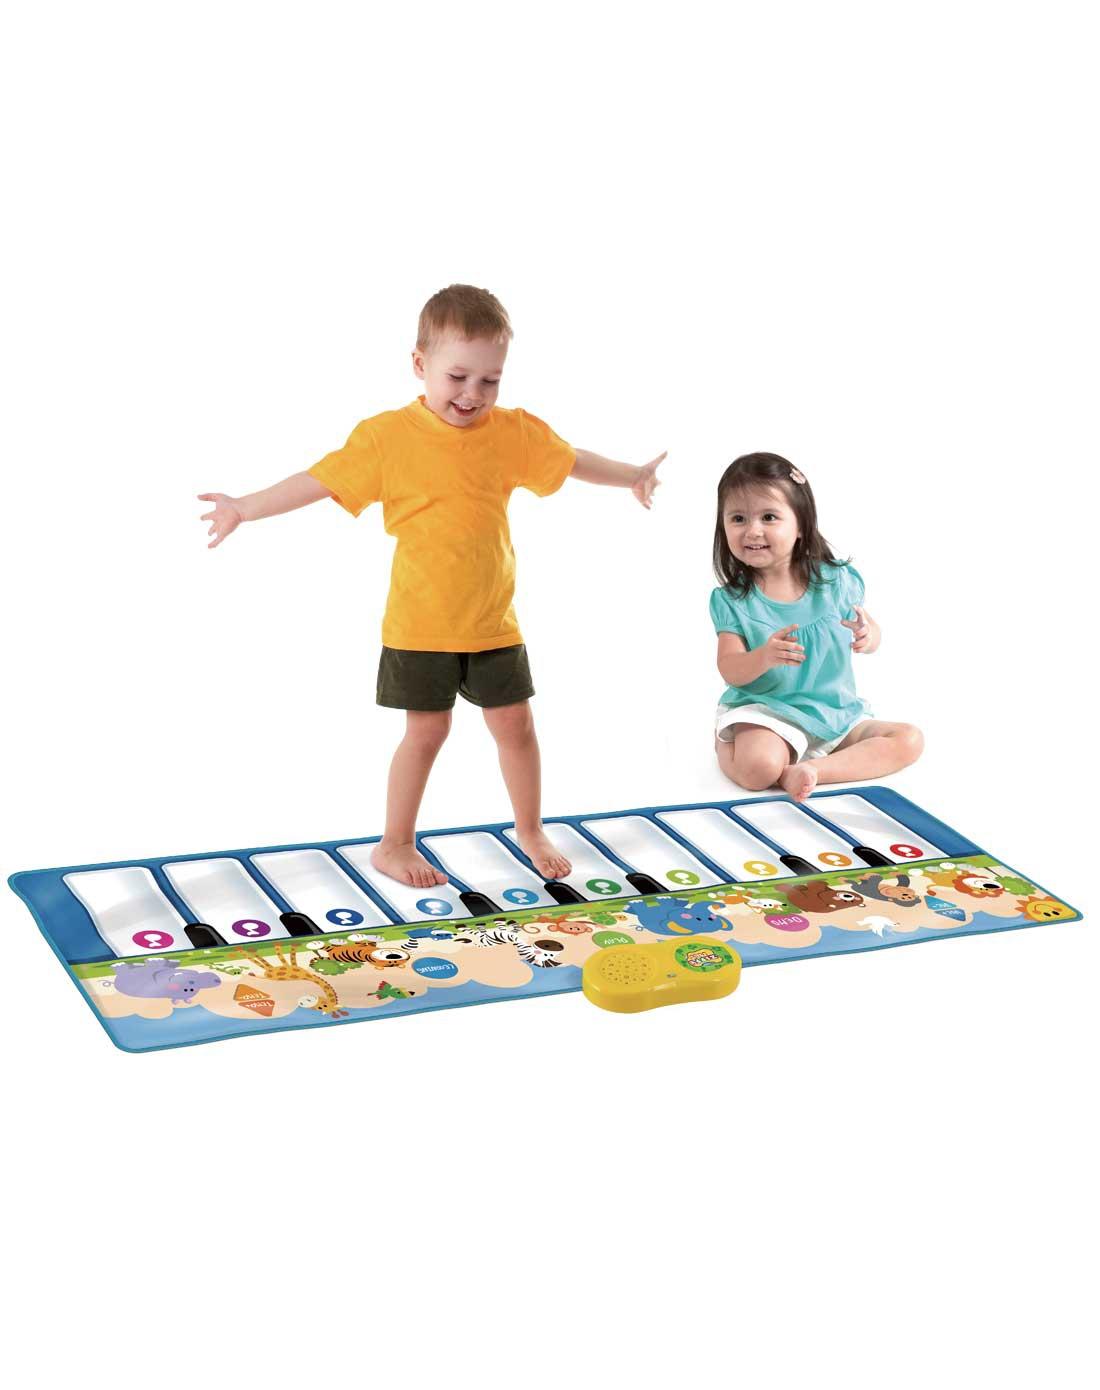 mat音乐魔毯专场教学儿童脚踩钢琴毯slw939图片